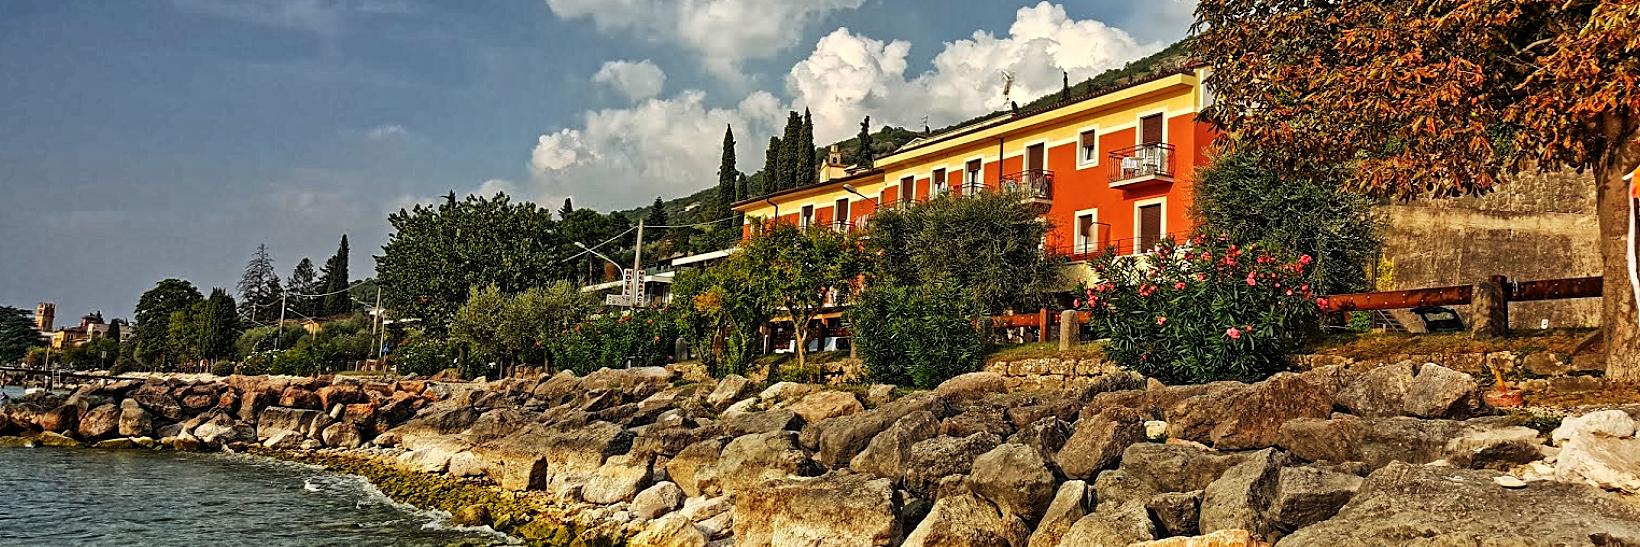 hotel-ristorante-menapace-torri-del-benaco-01.png